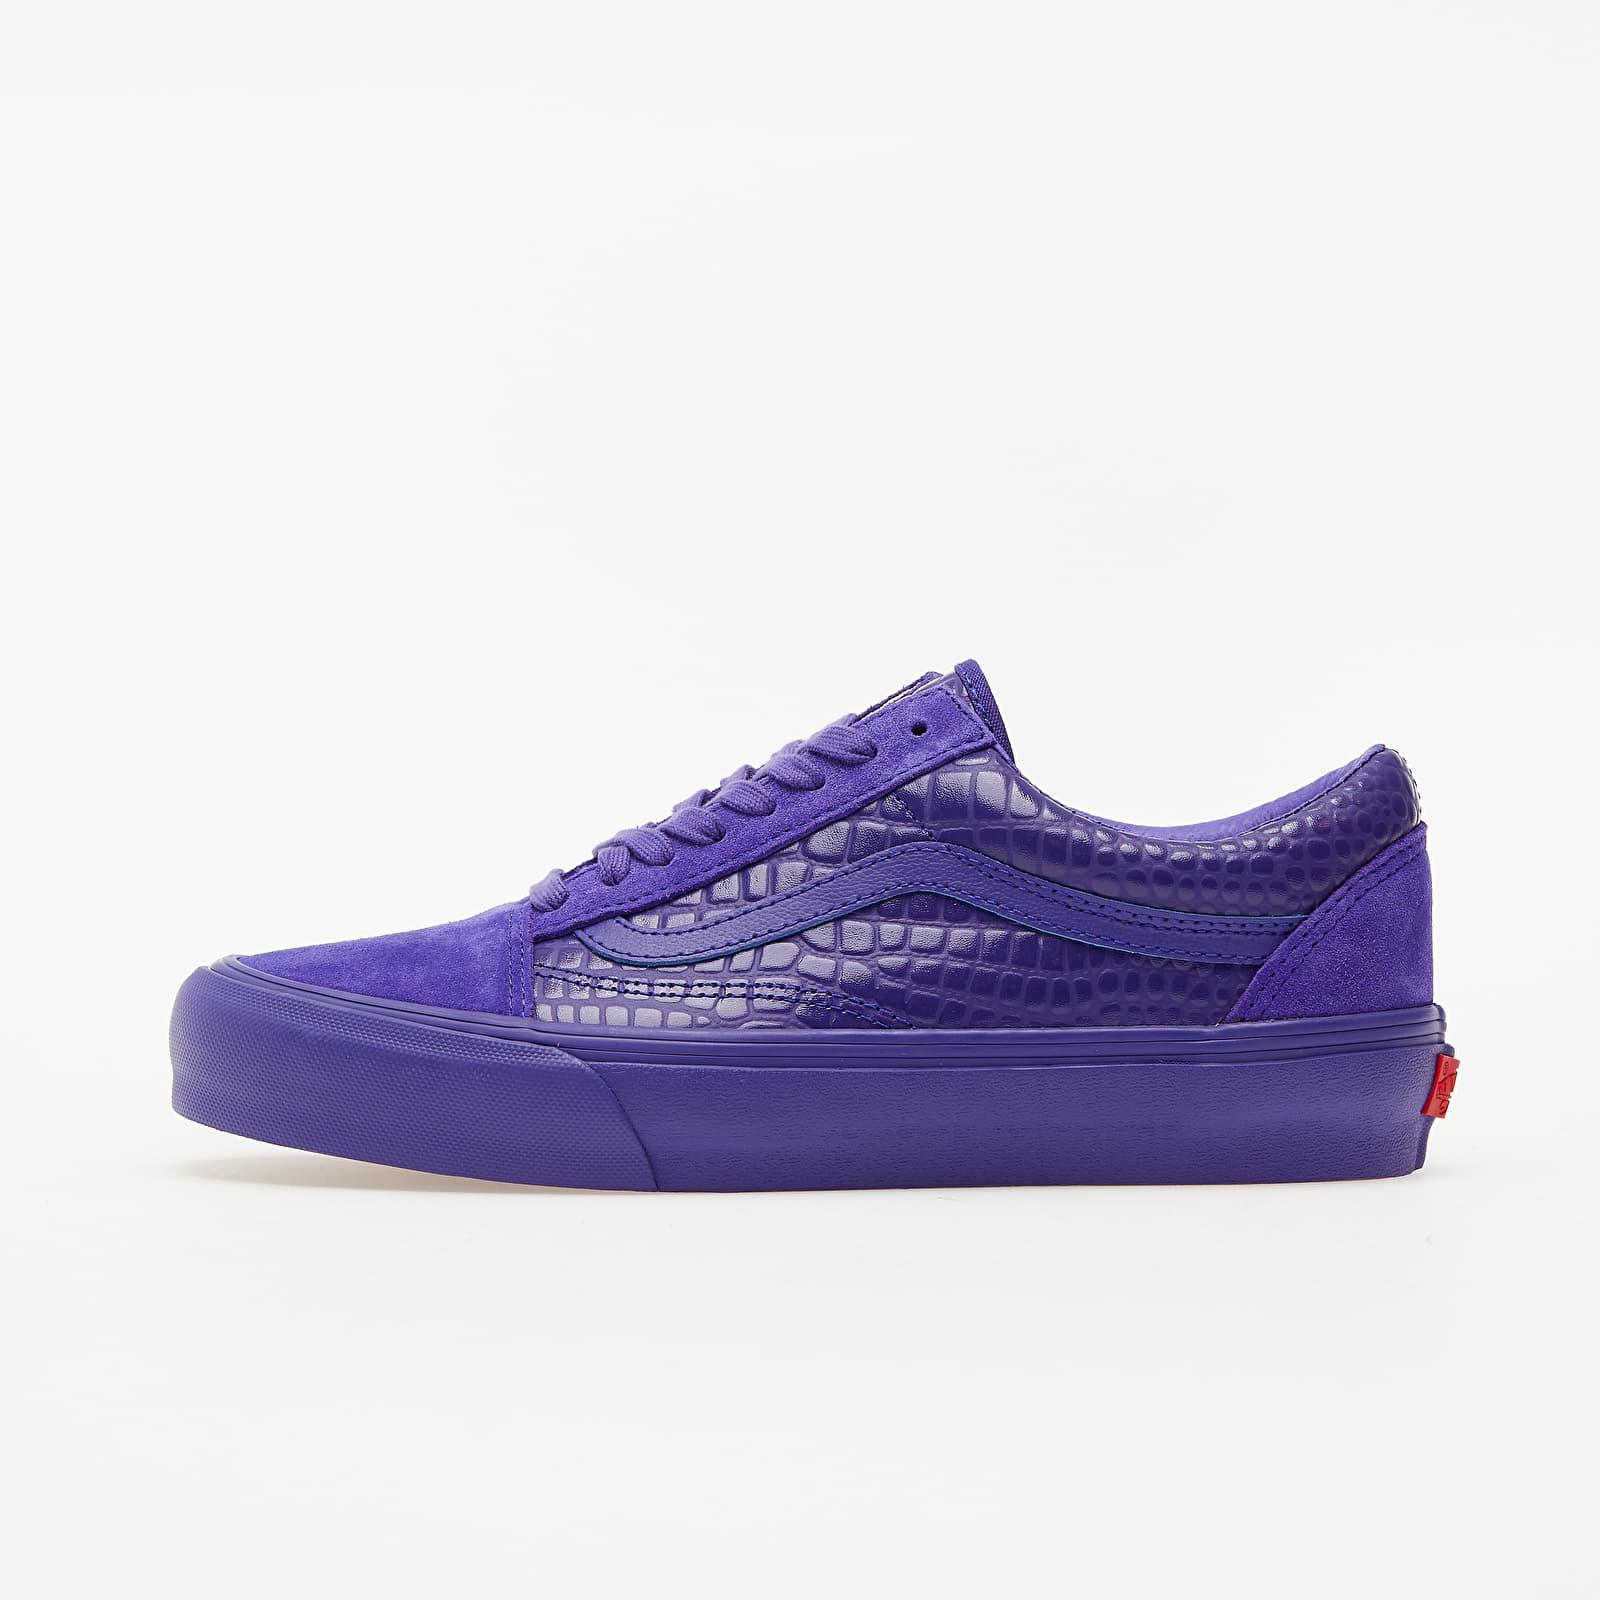 Pánske tenisky a topánky Vans Old Skool VLT LX (Croc Skin) Deep Blue